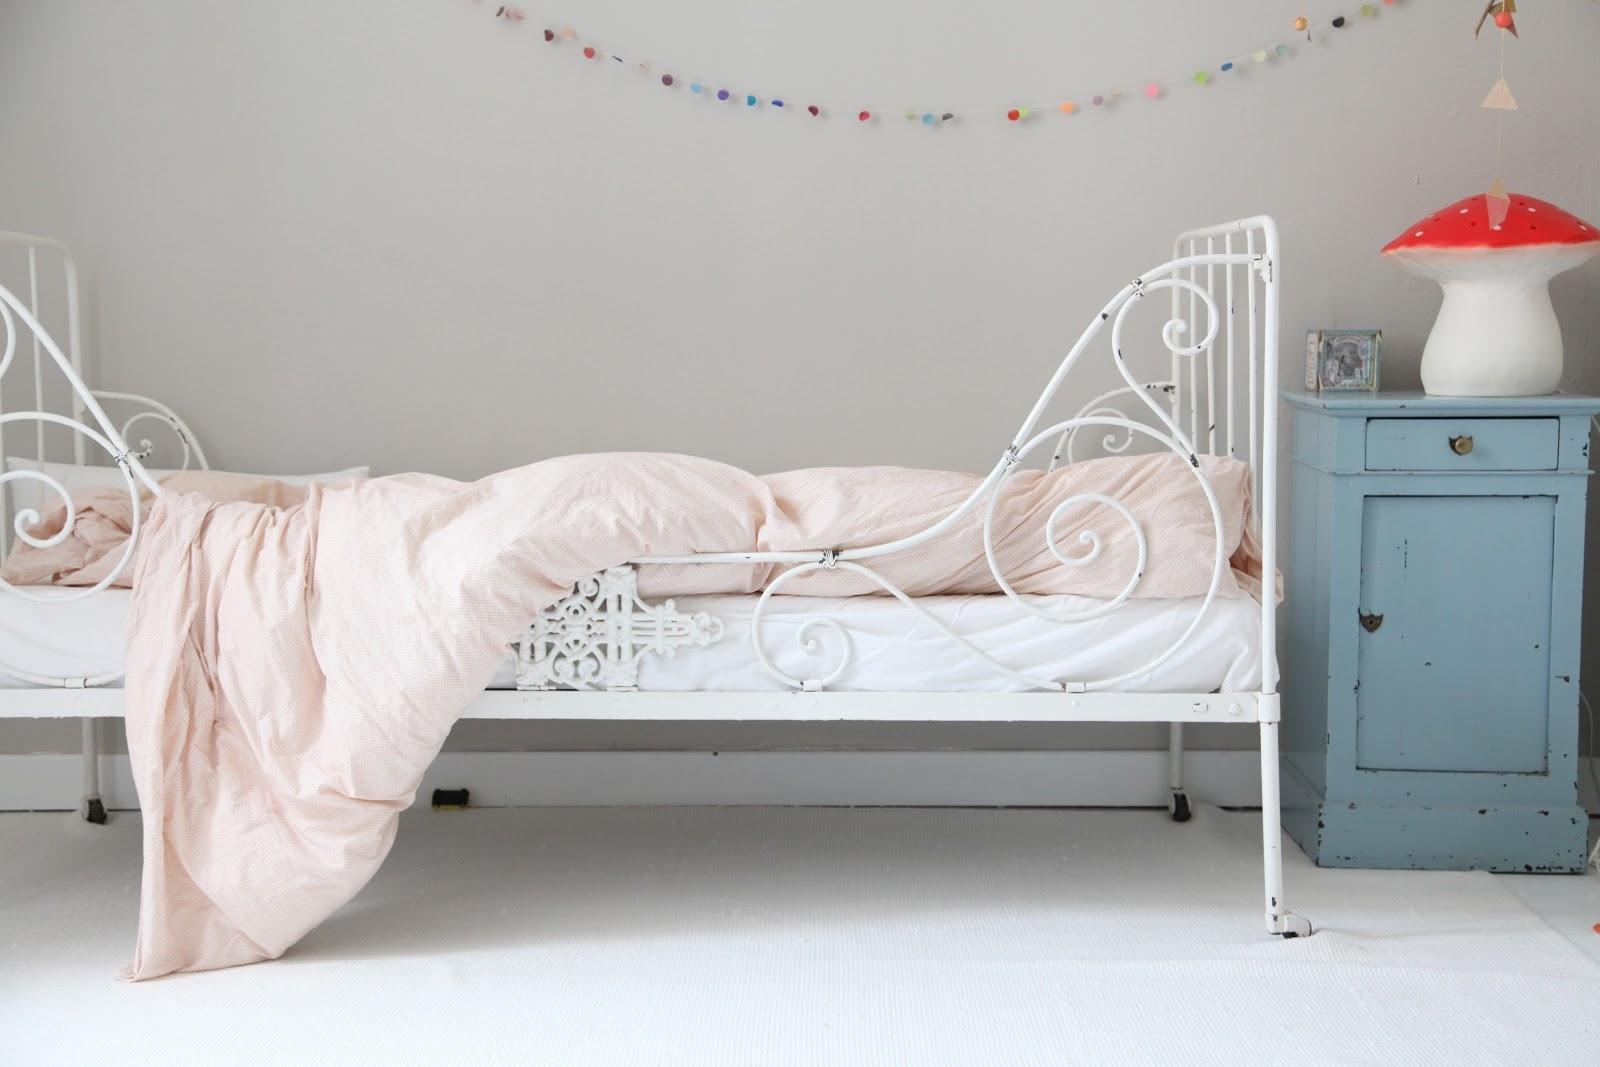 Metal Toddler Bed Ideas On Foter